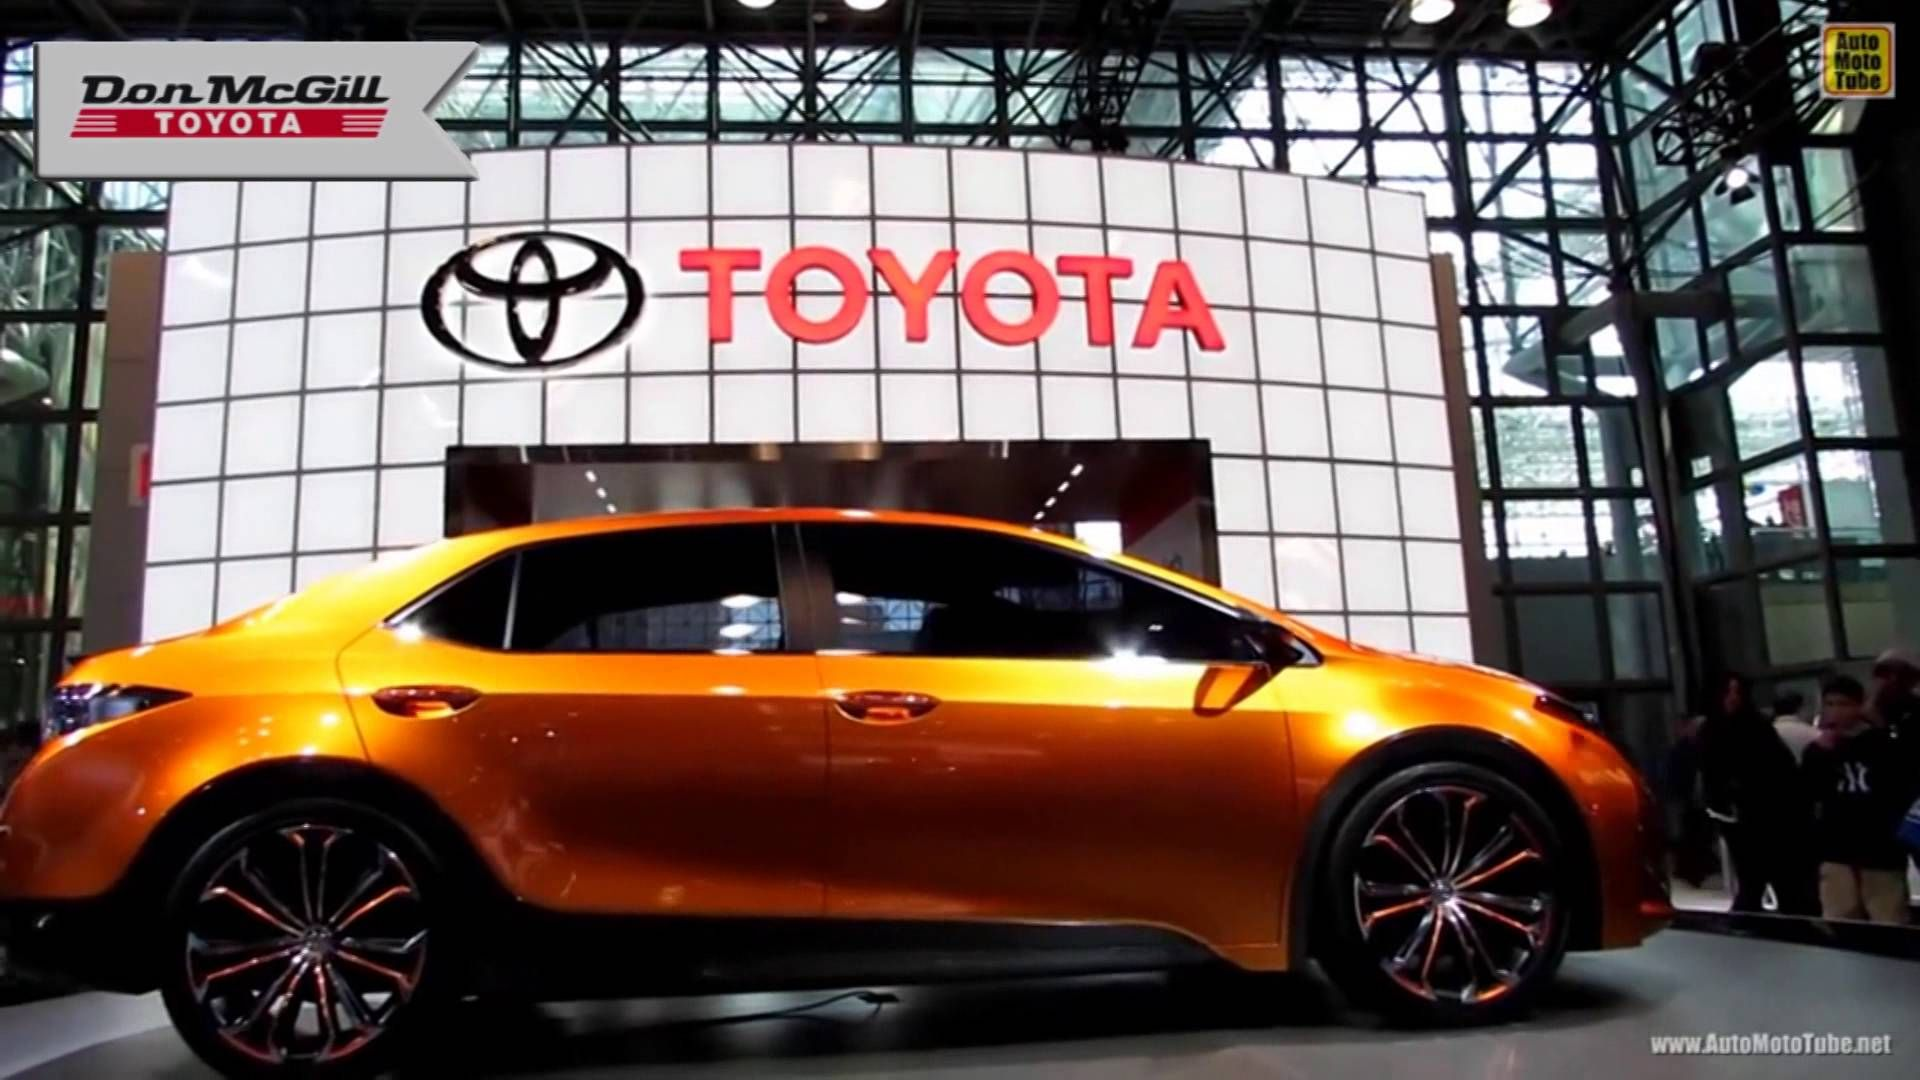 Houston, TX 2014 2015 Toyota Corolla Furia Specials